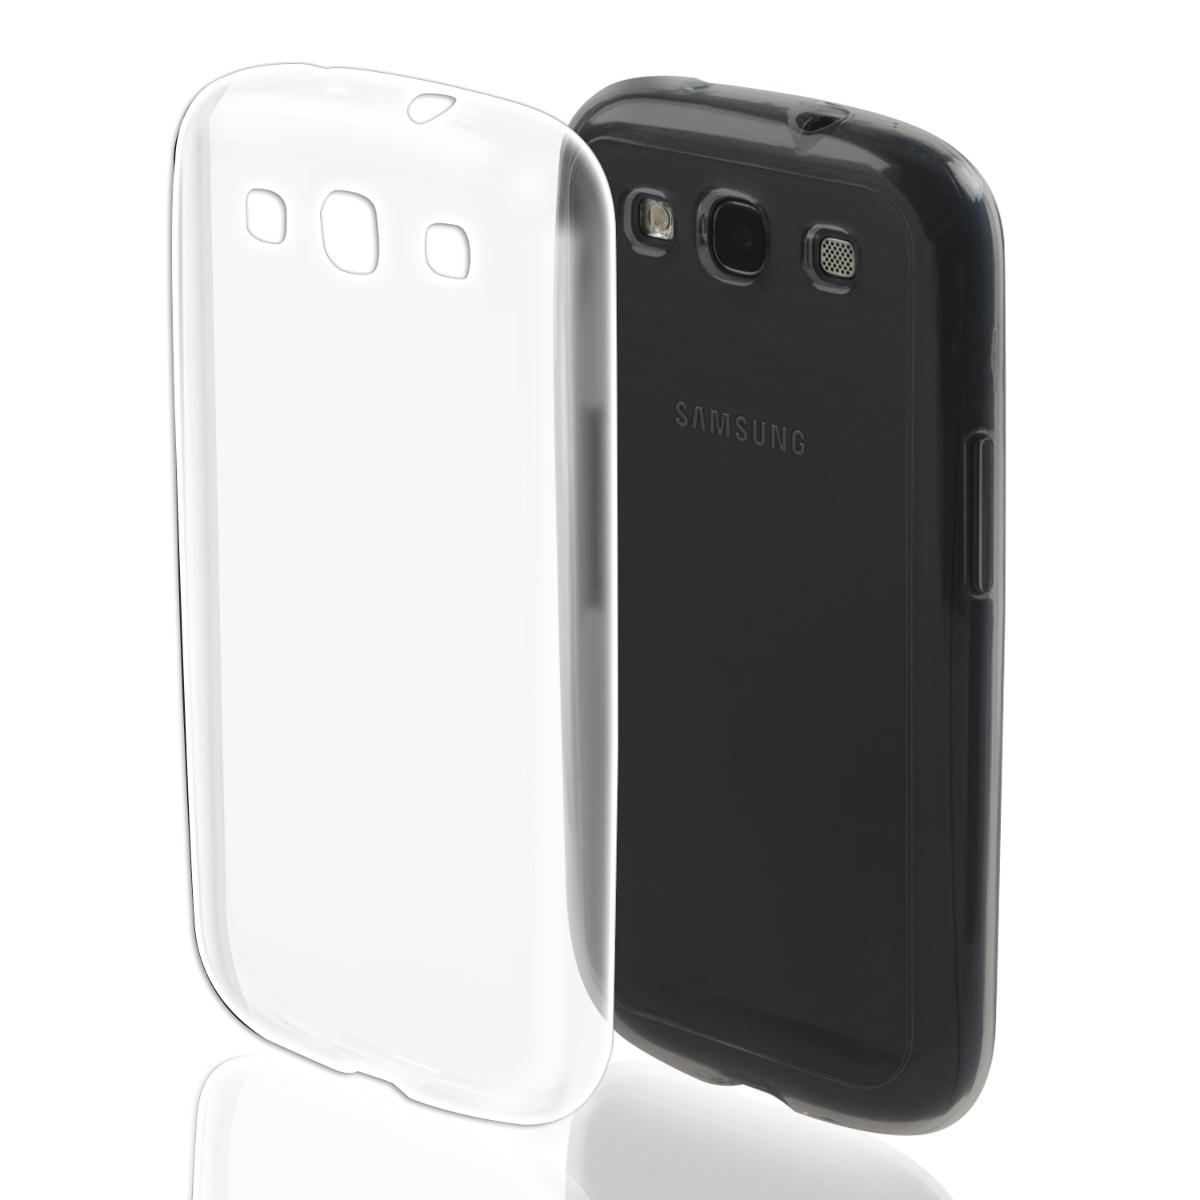 Tpu samsung galaxy s3 s3 neo - Tpu Silicone Crystal Case For Samsung Galaxy S3